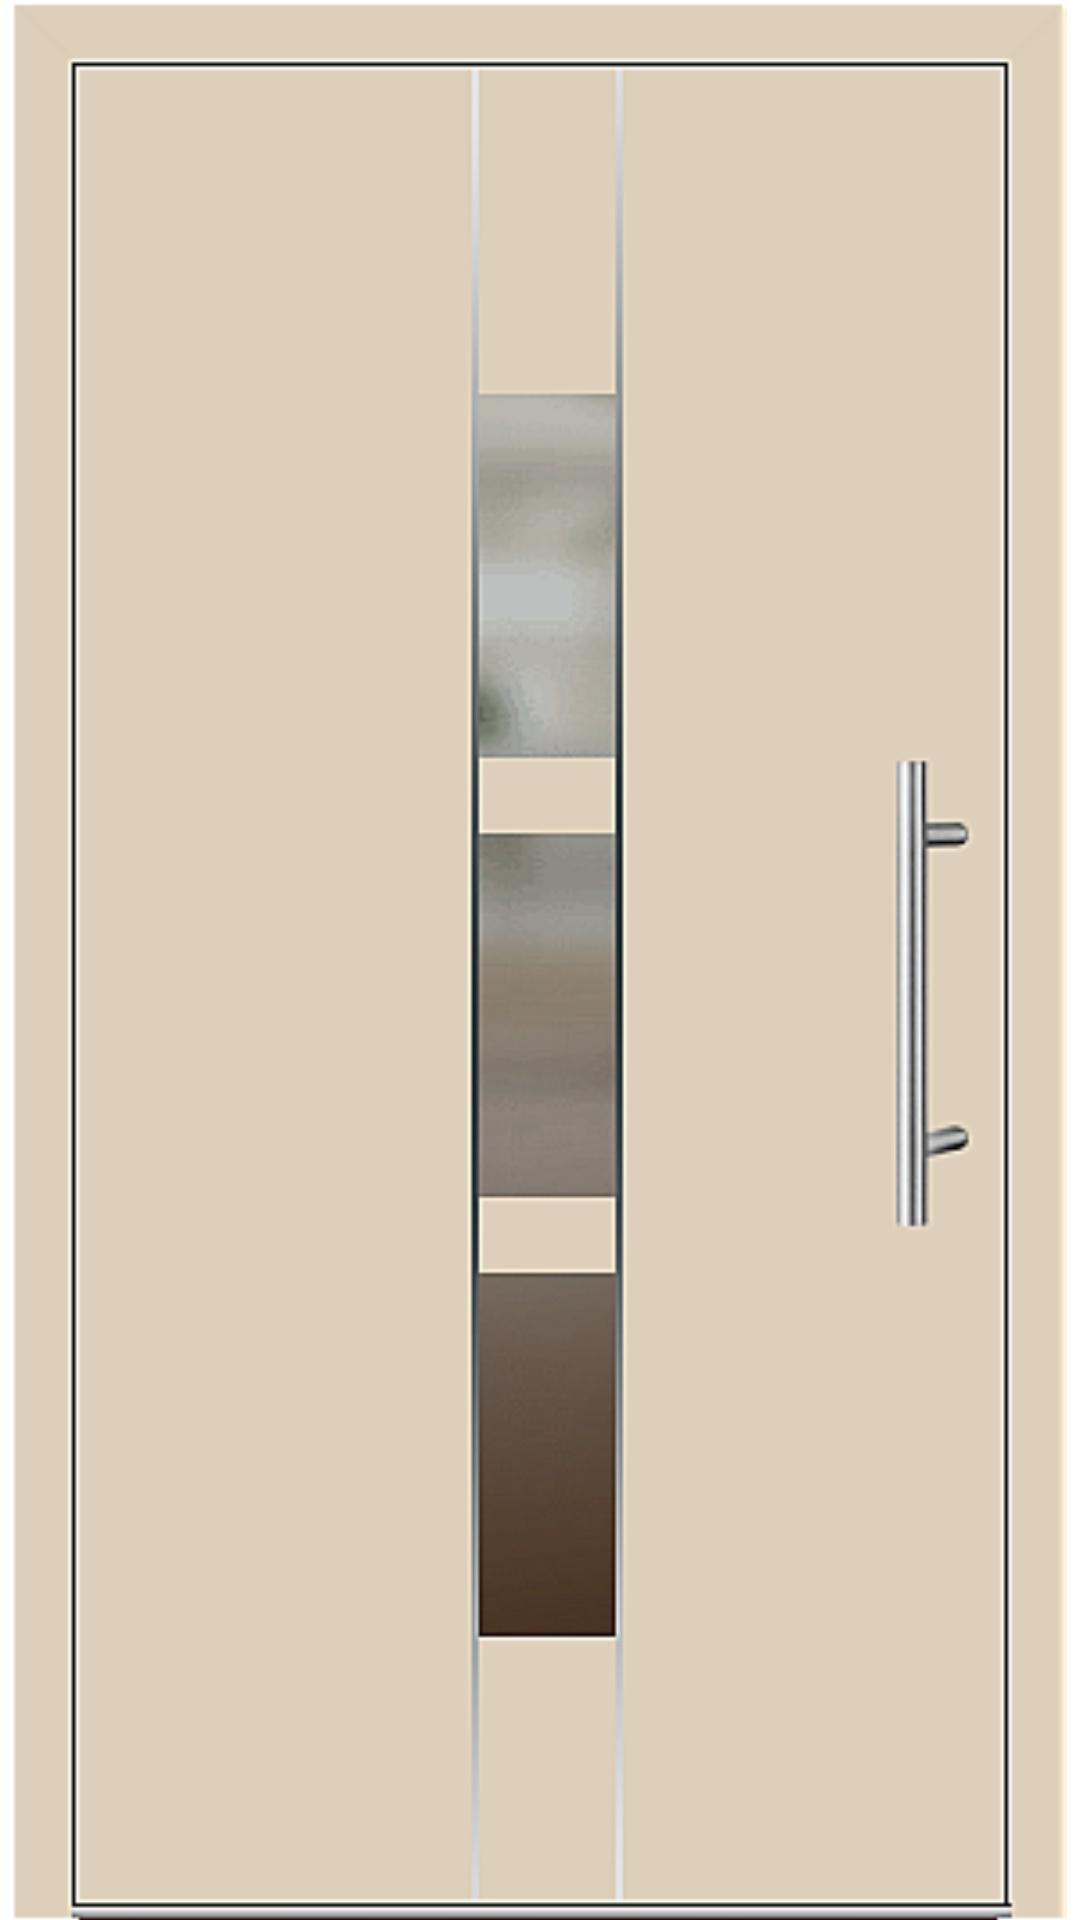 Aluminium Haustür Modell 6183-54 beige